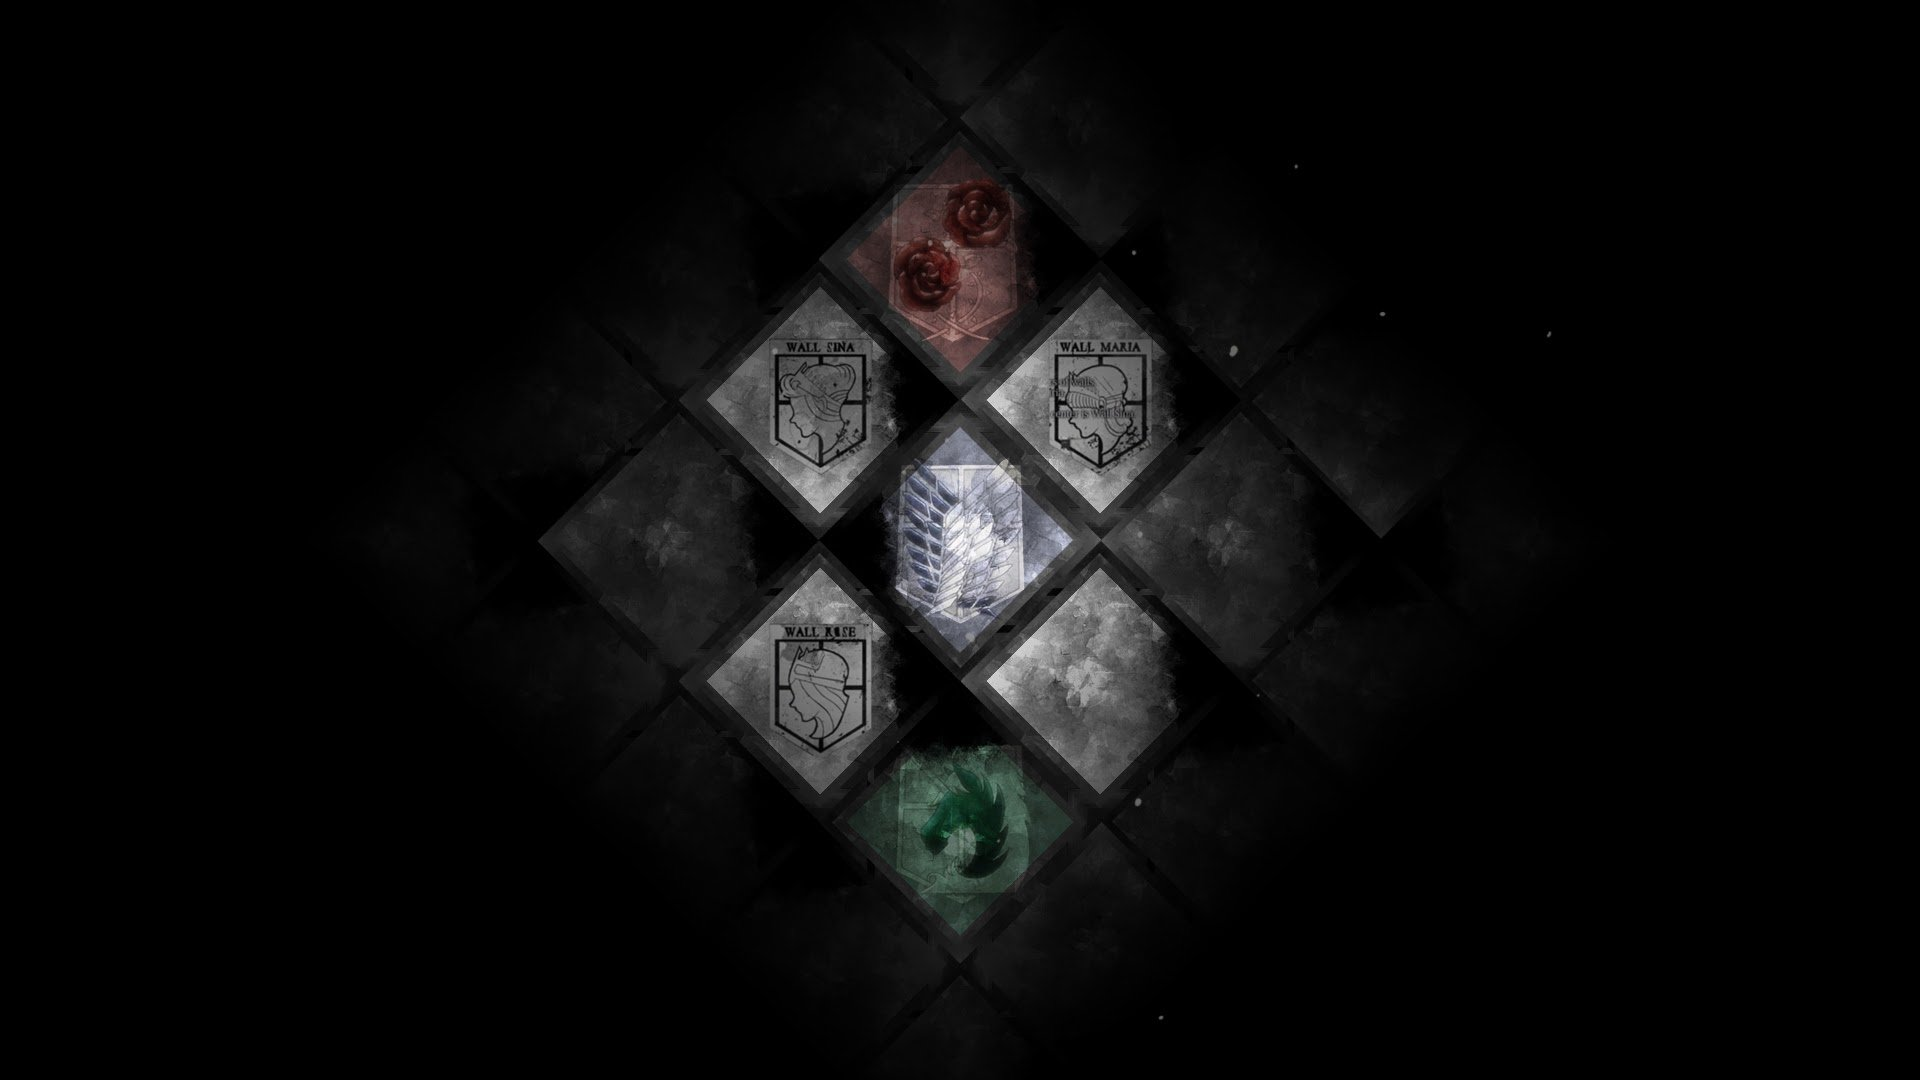 Attack On Titan Emblem Hd Wallpaper Background Image 1920x1080 Id 606211 Wallpaper Abyss